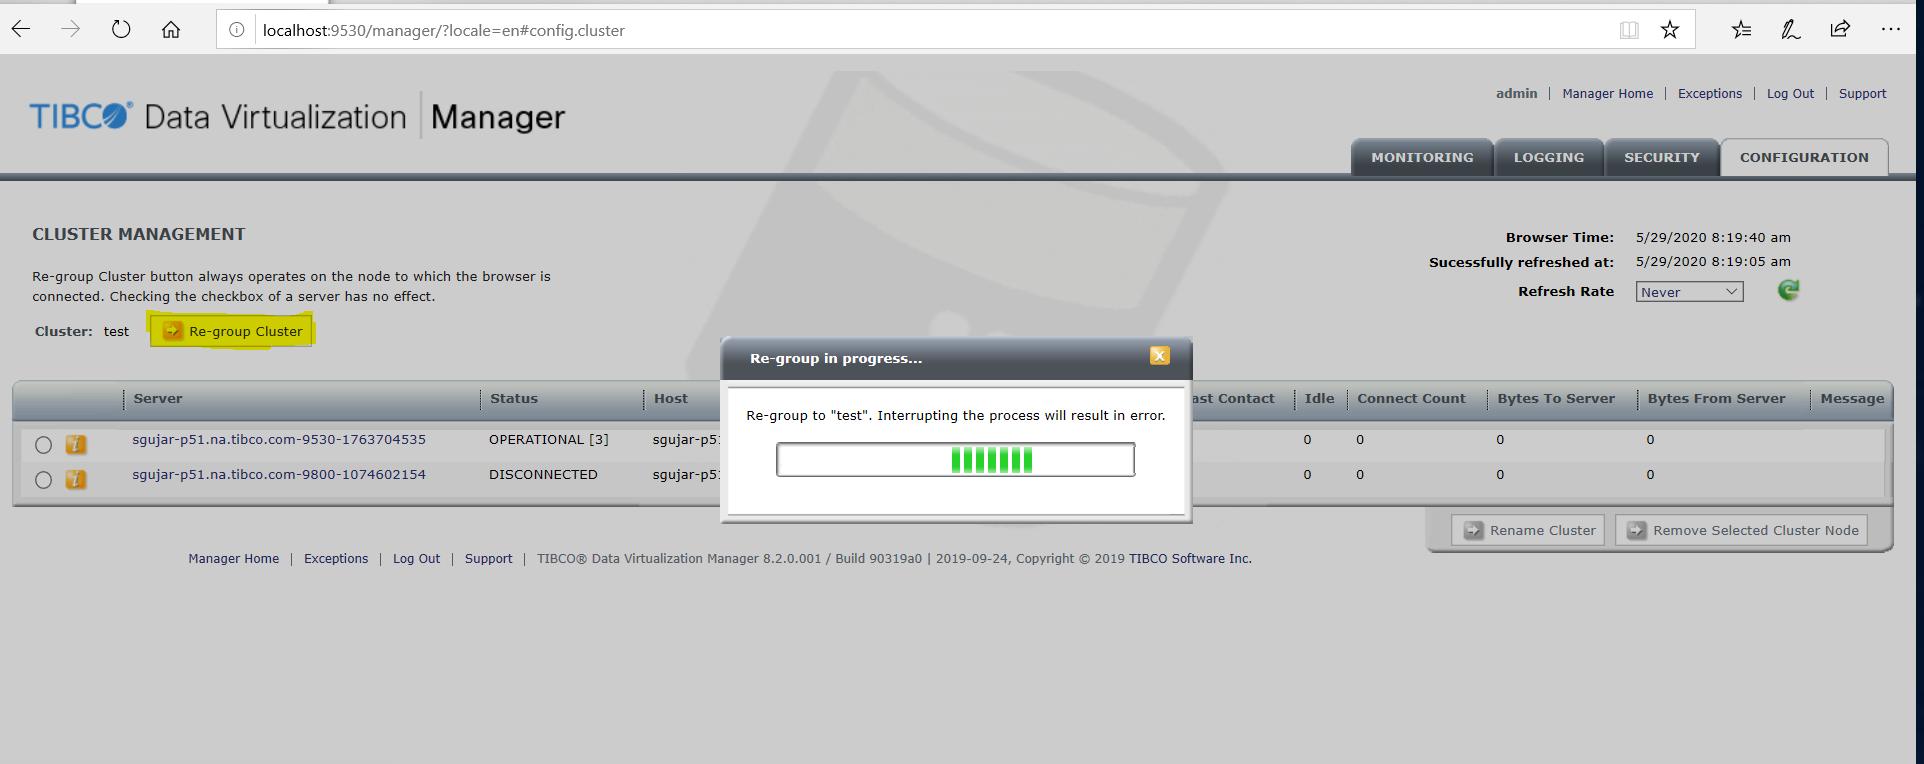 Afbeelding van TIBCO Data Virtualization tools.